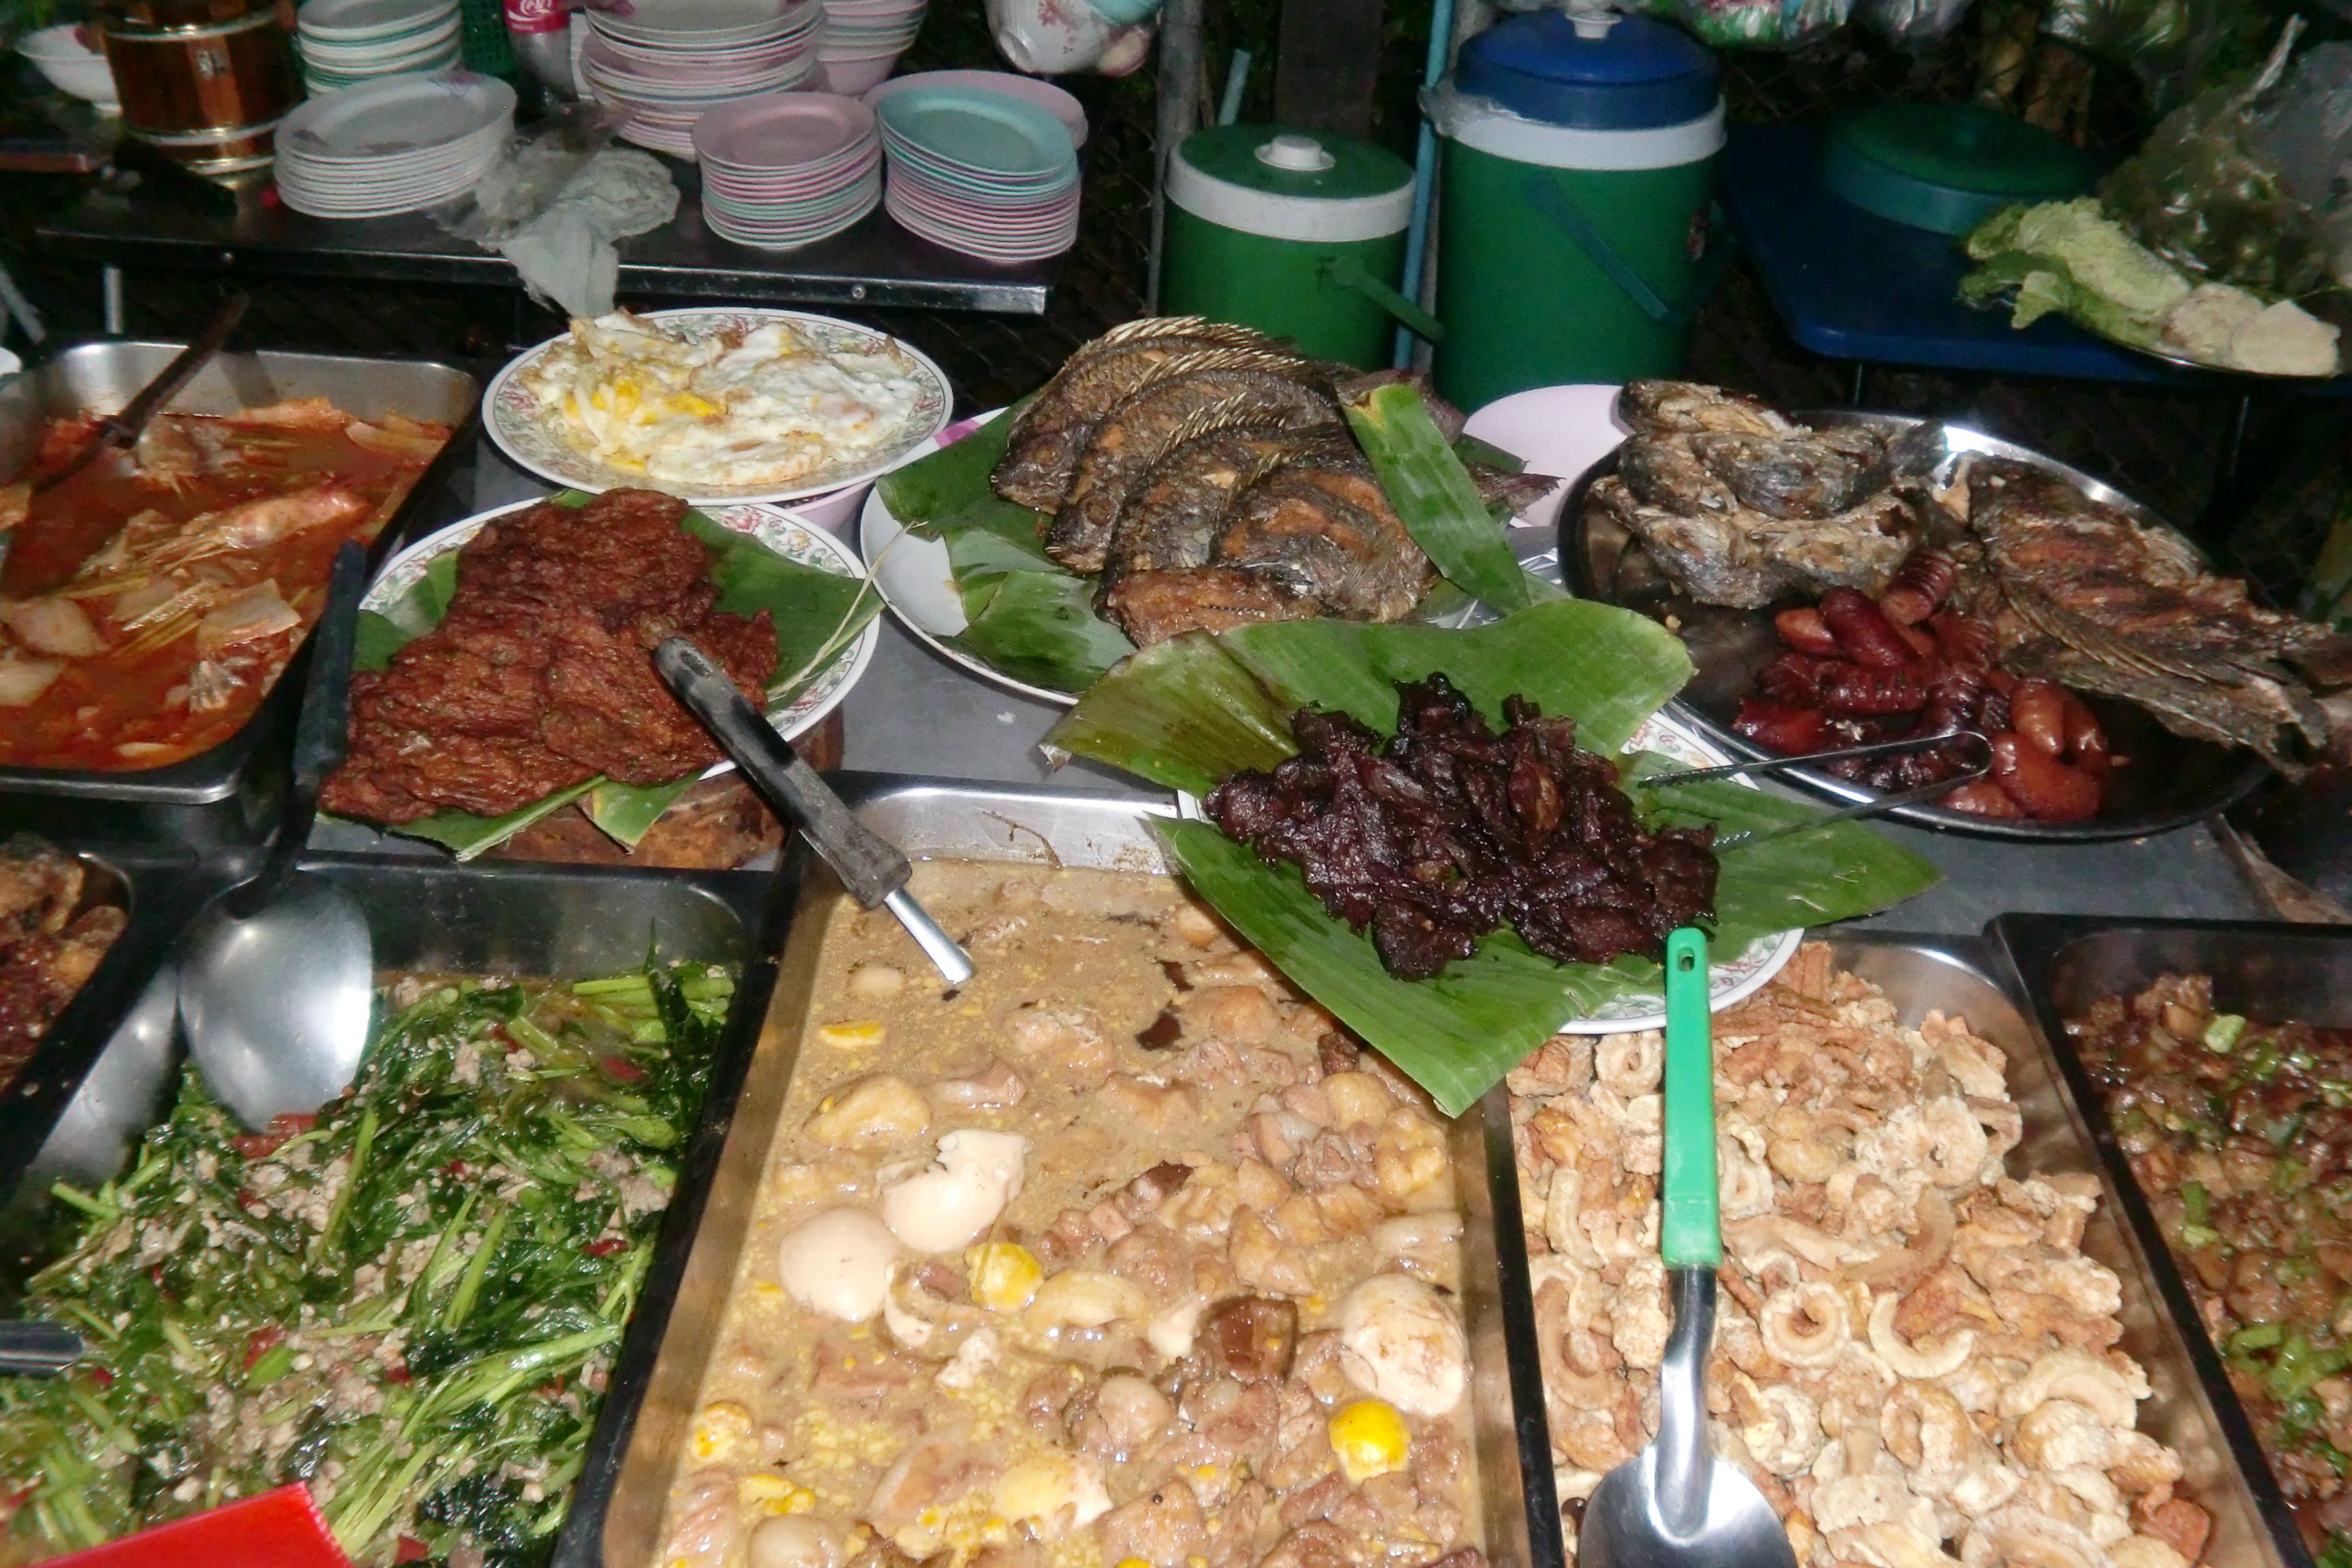 file:angebot einer garküche in bangkok - wikimedia commons